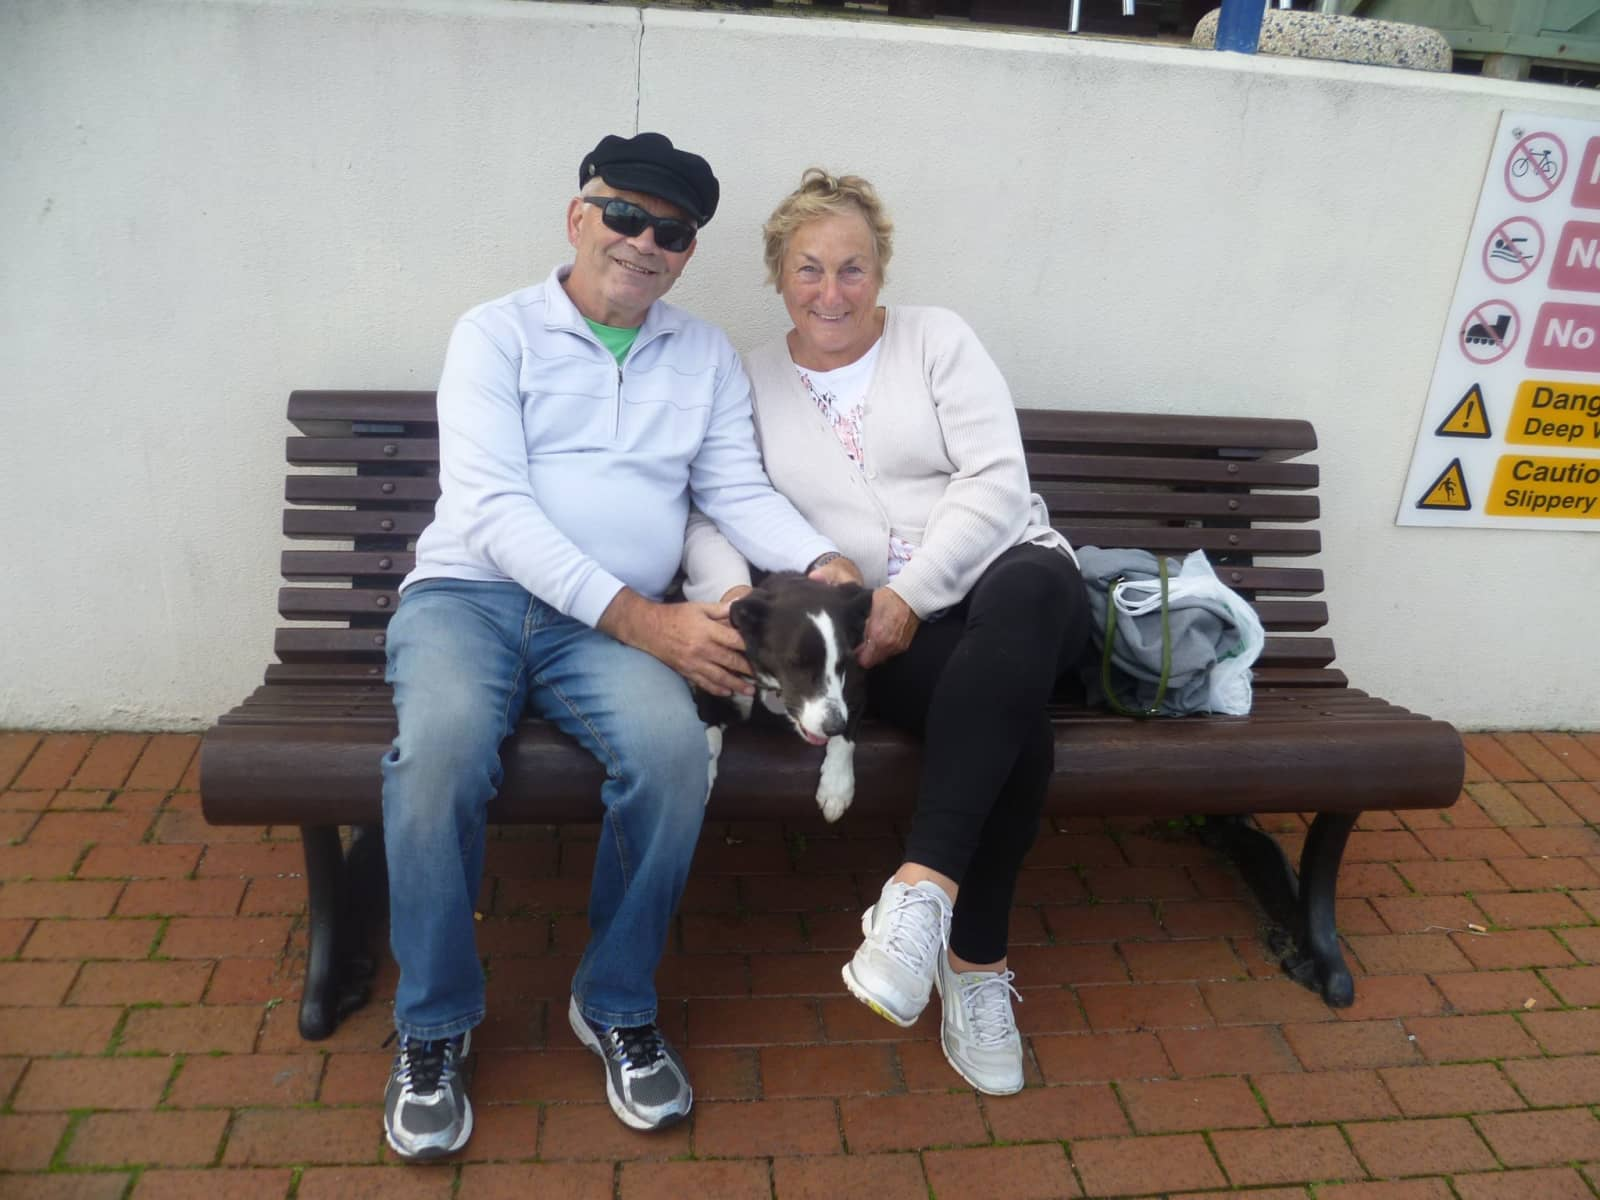 Margaret & Franciscus (frank) from Winnipeg, Manitoba, Canada